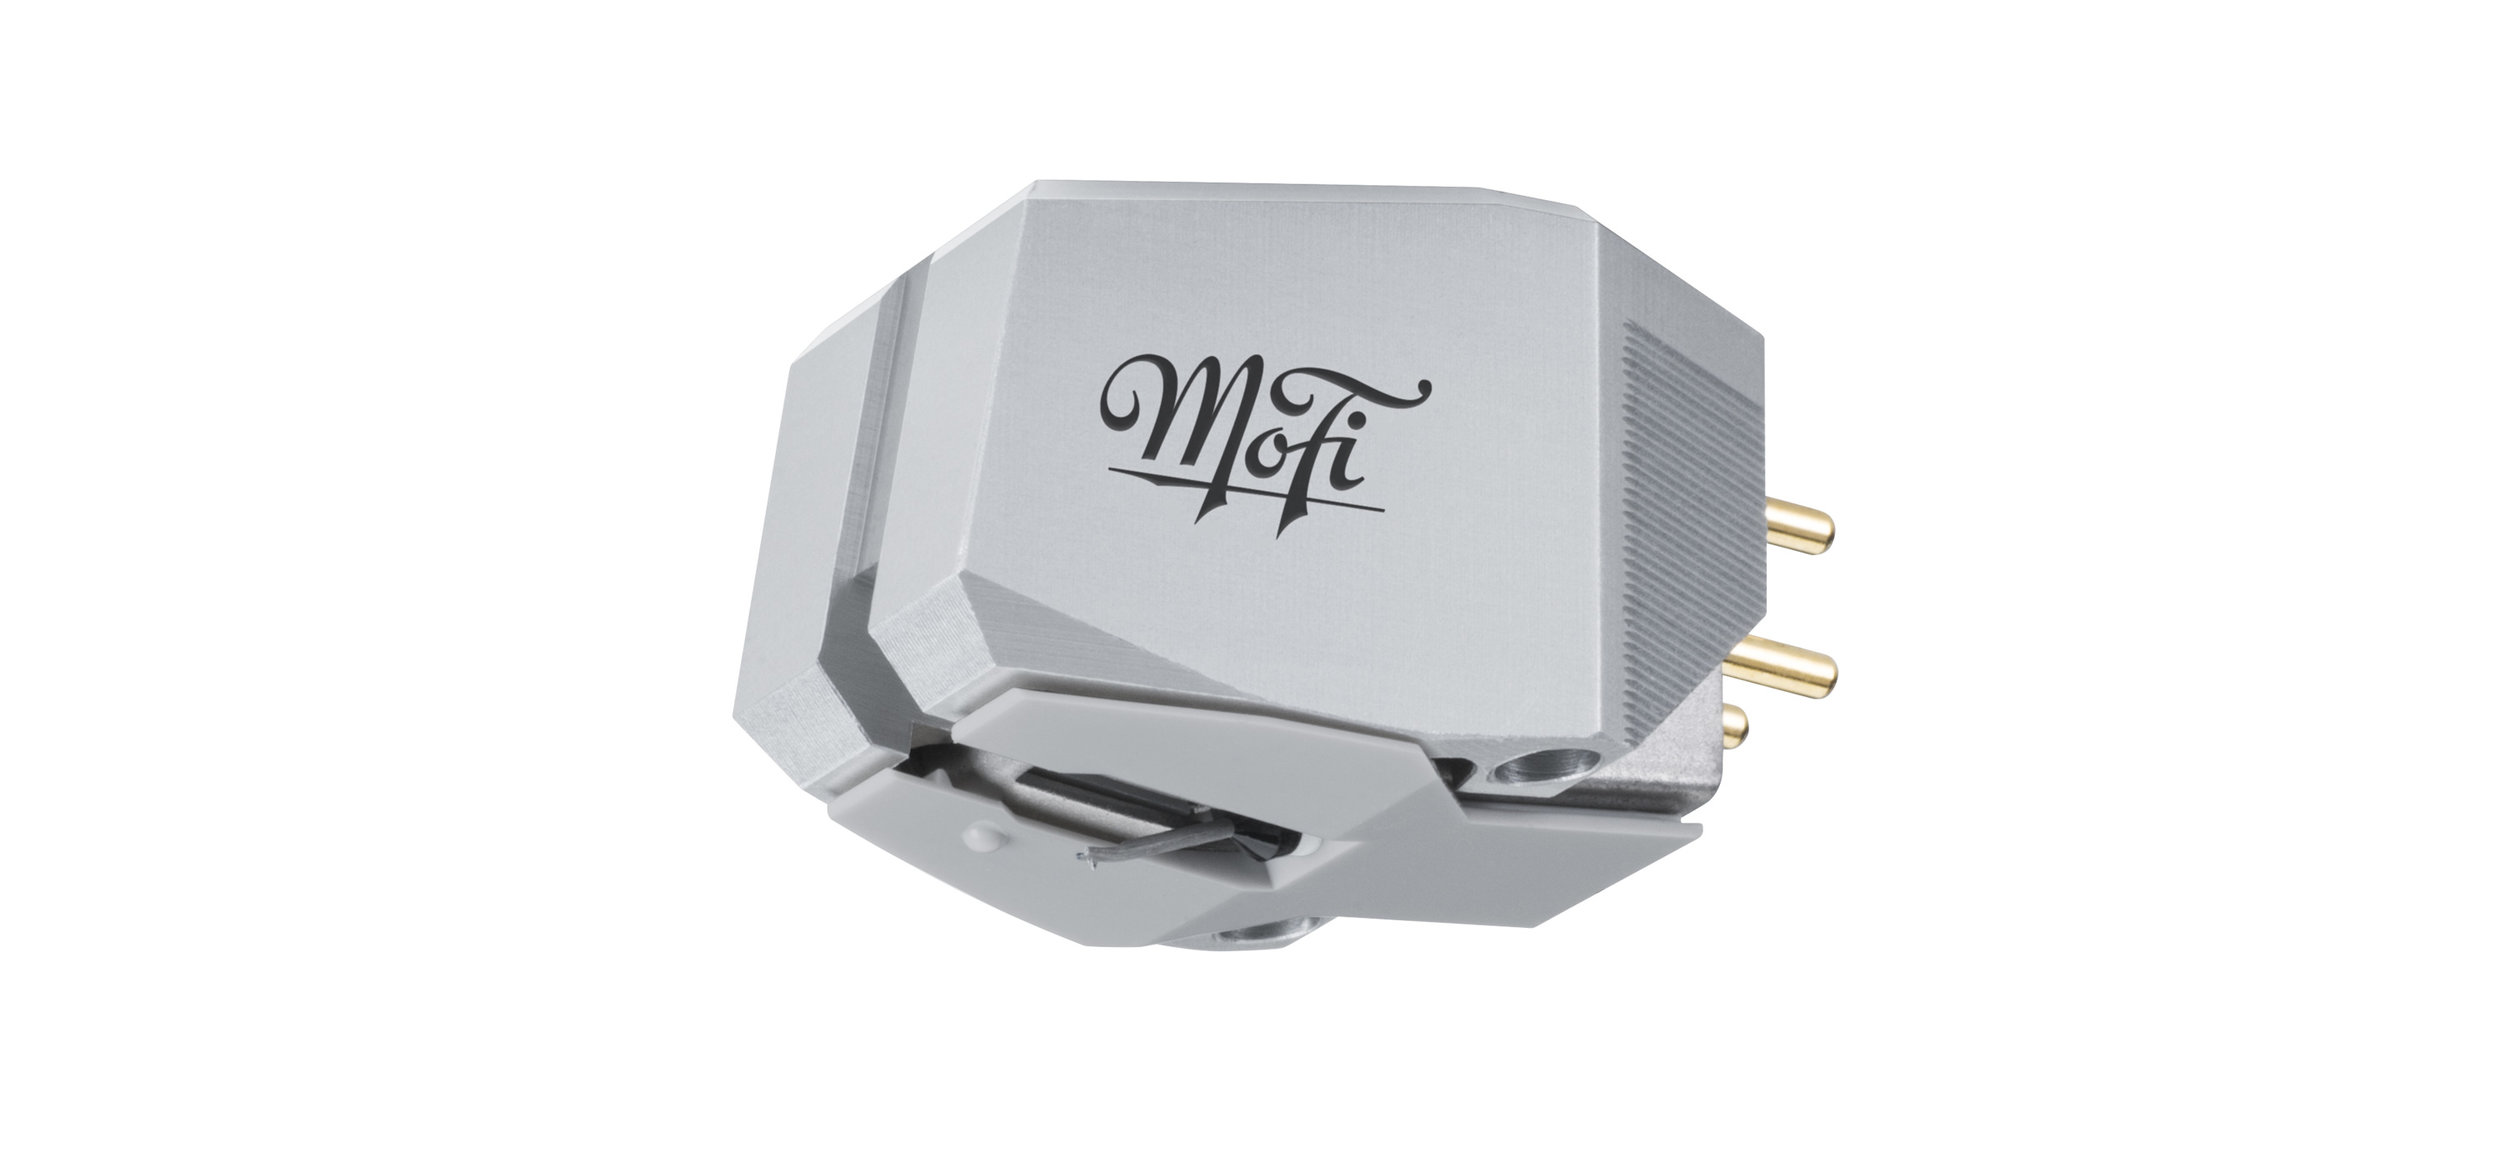 MoFi_Electronics_UltraTracker_Angle_Left_Low.jpg